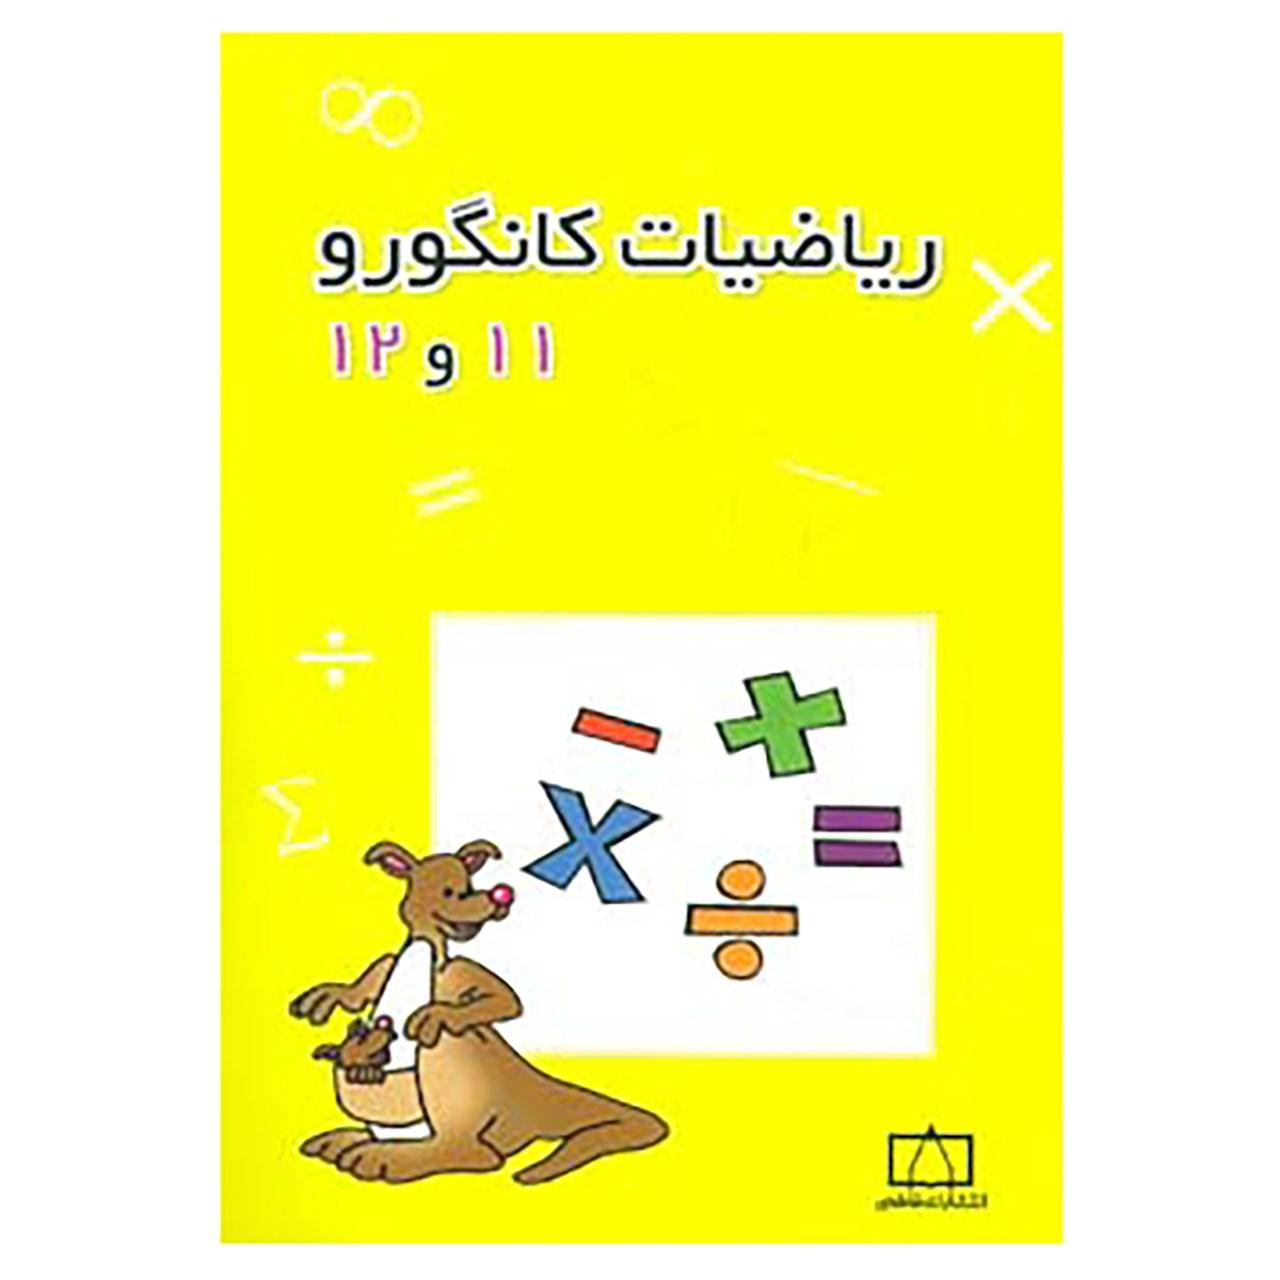 کتاب ریاضیات کانگورو 11 و 12